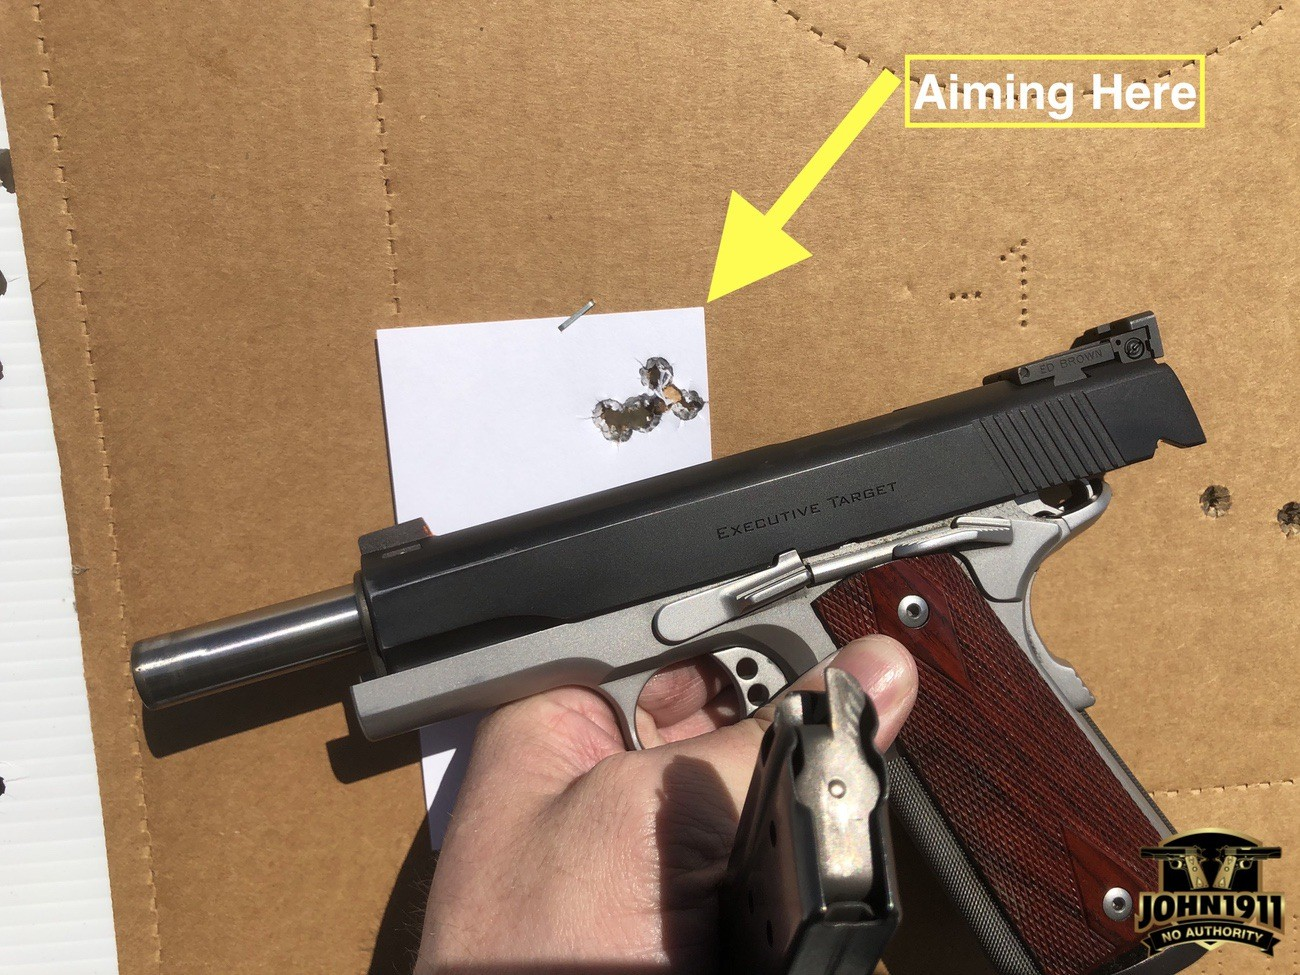 Executive Target 9mm Ed Brown 1911.